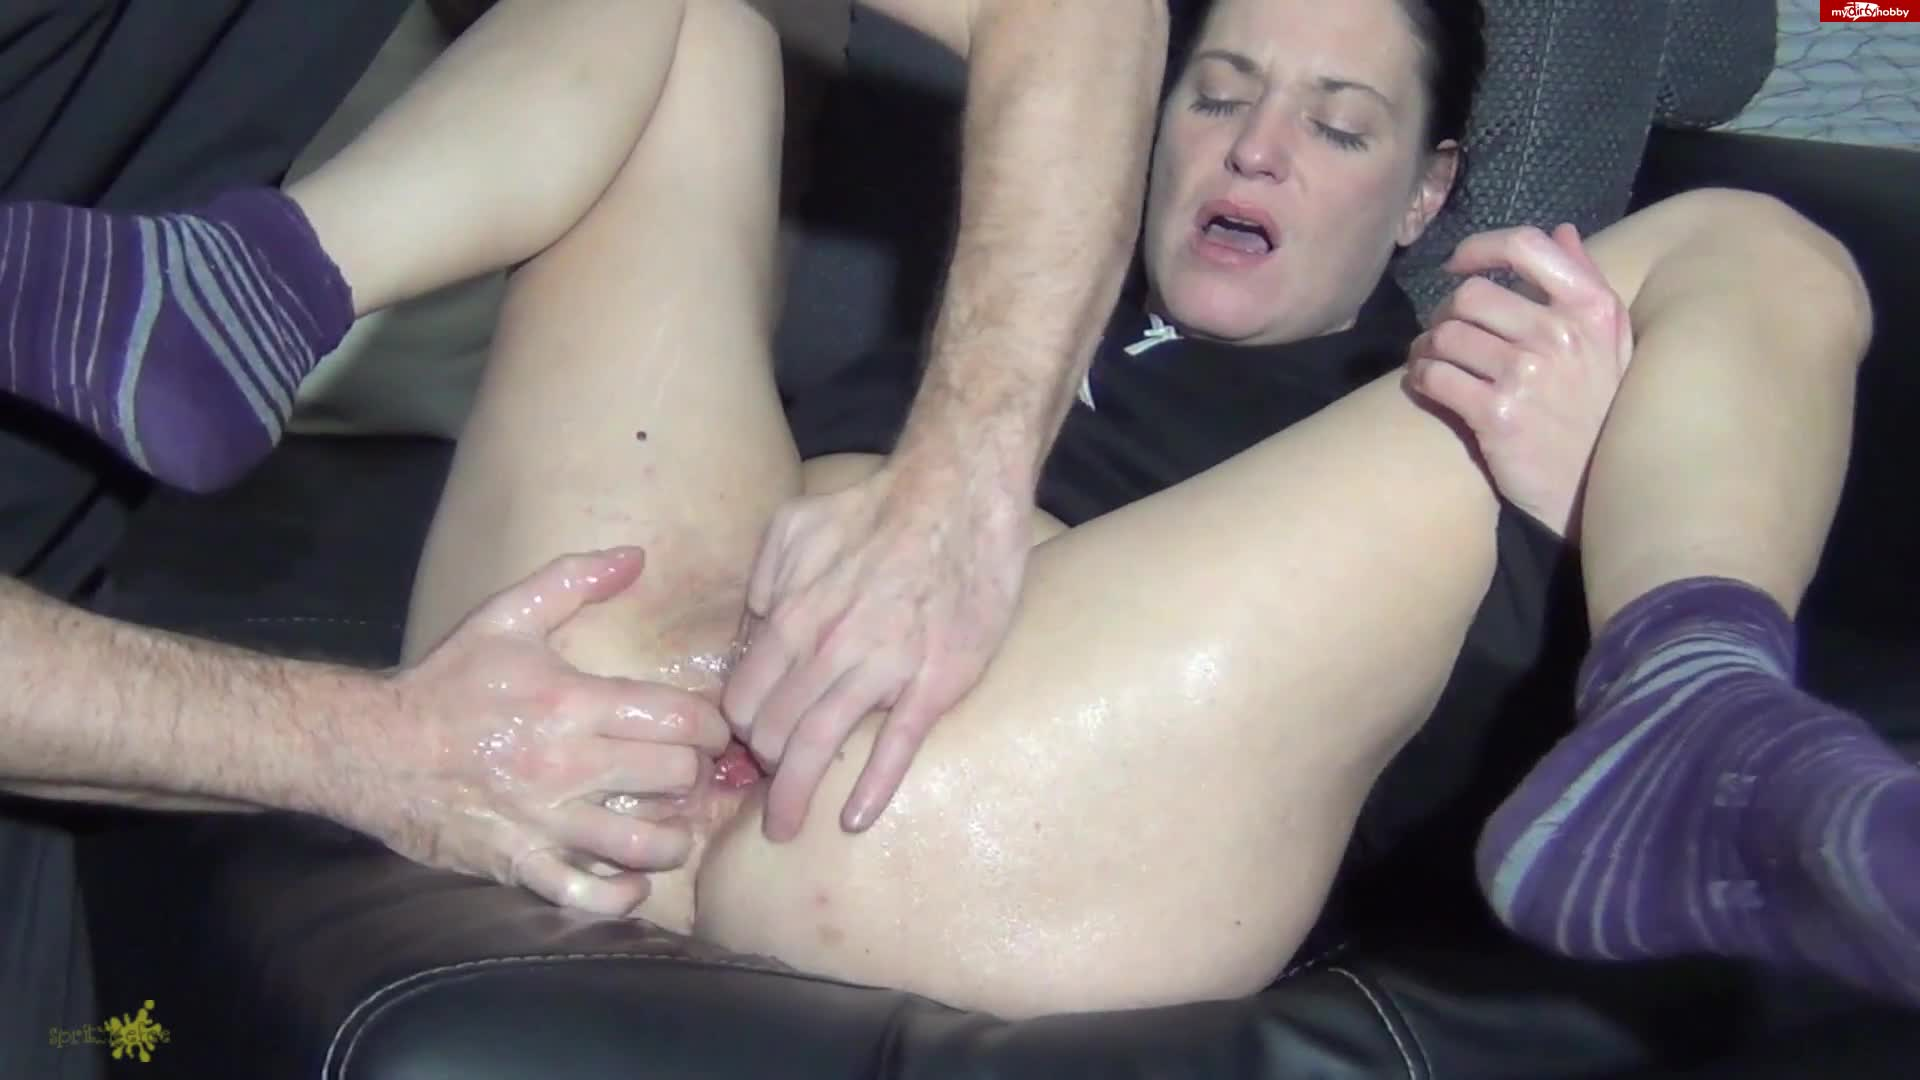 Tiny Lesbian Anal Fisting